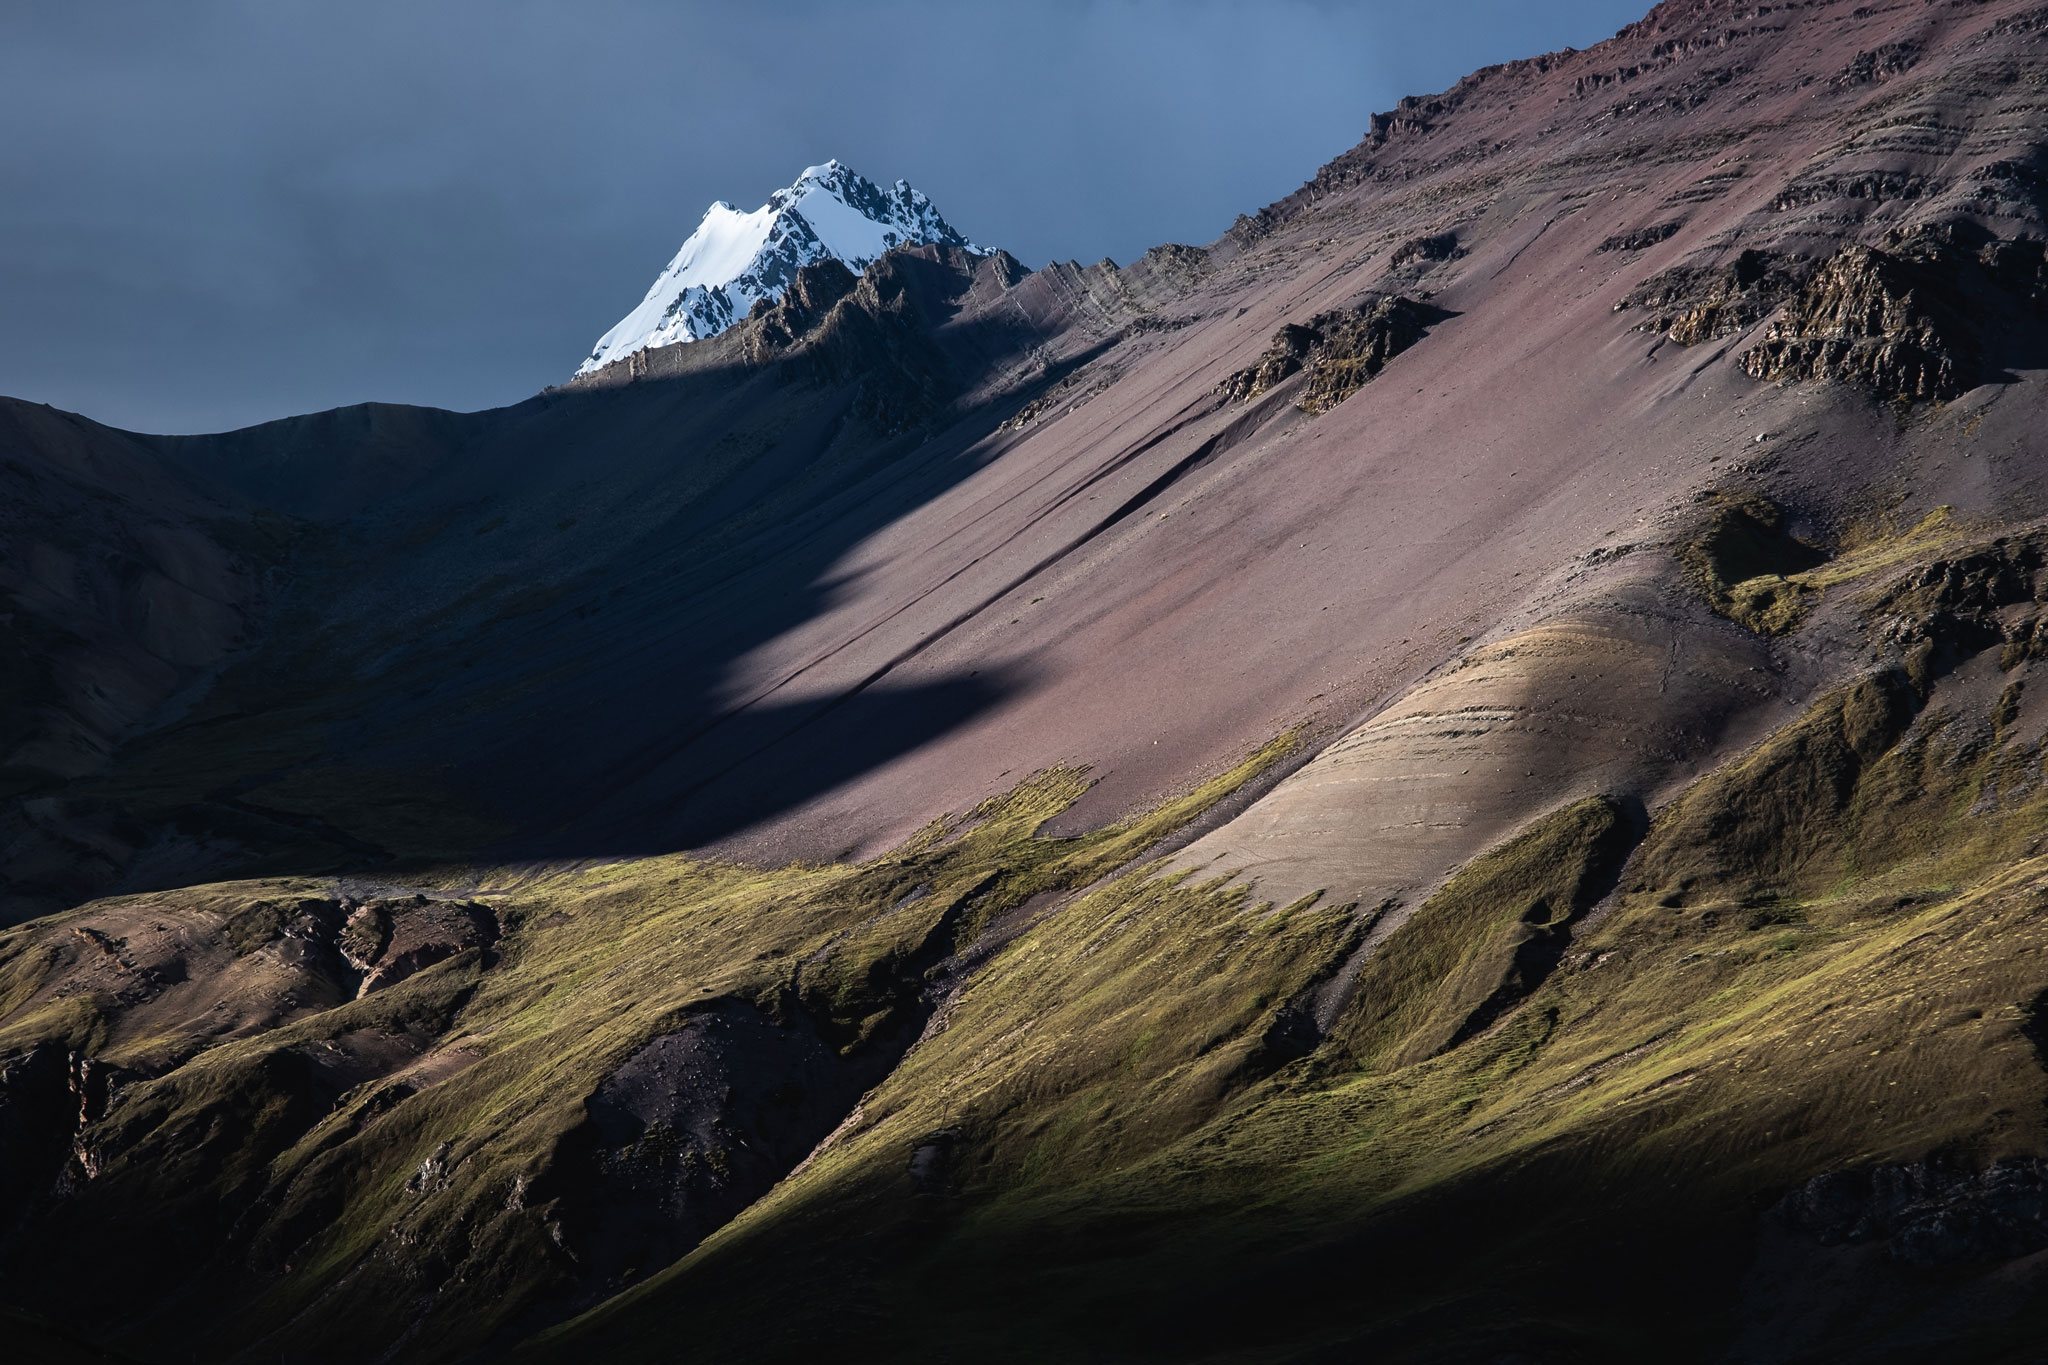 landscape-dramatic-light-ausangate-peru